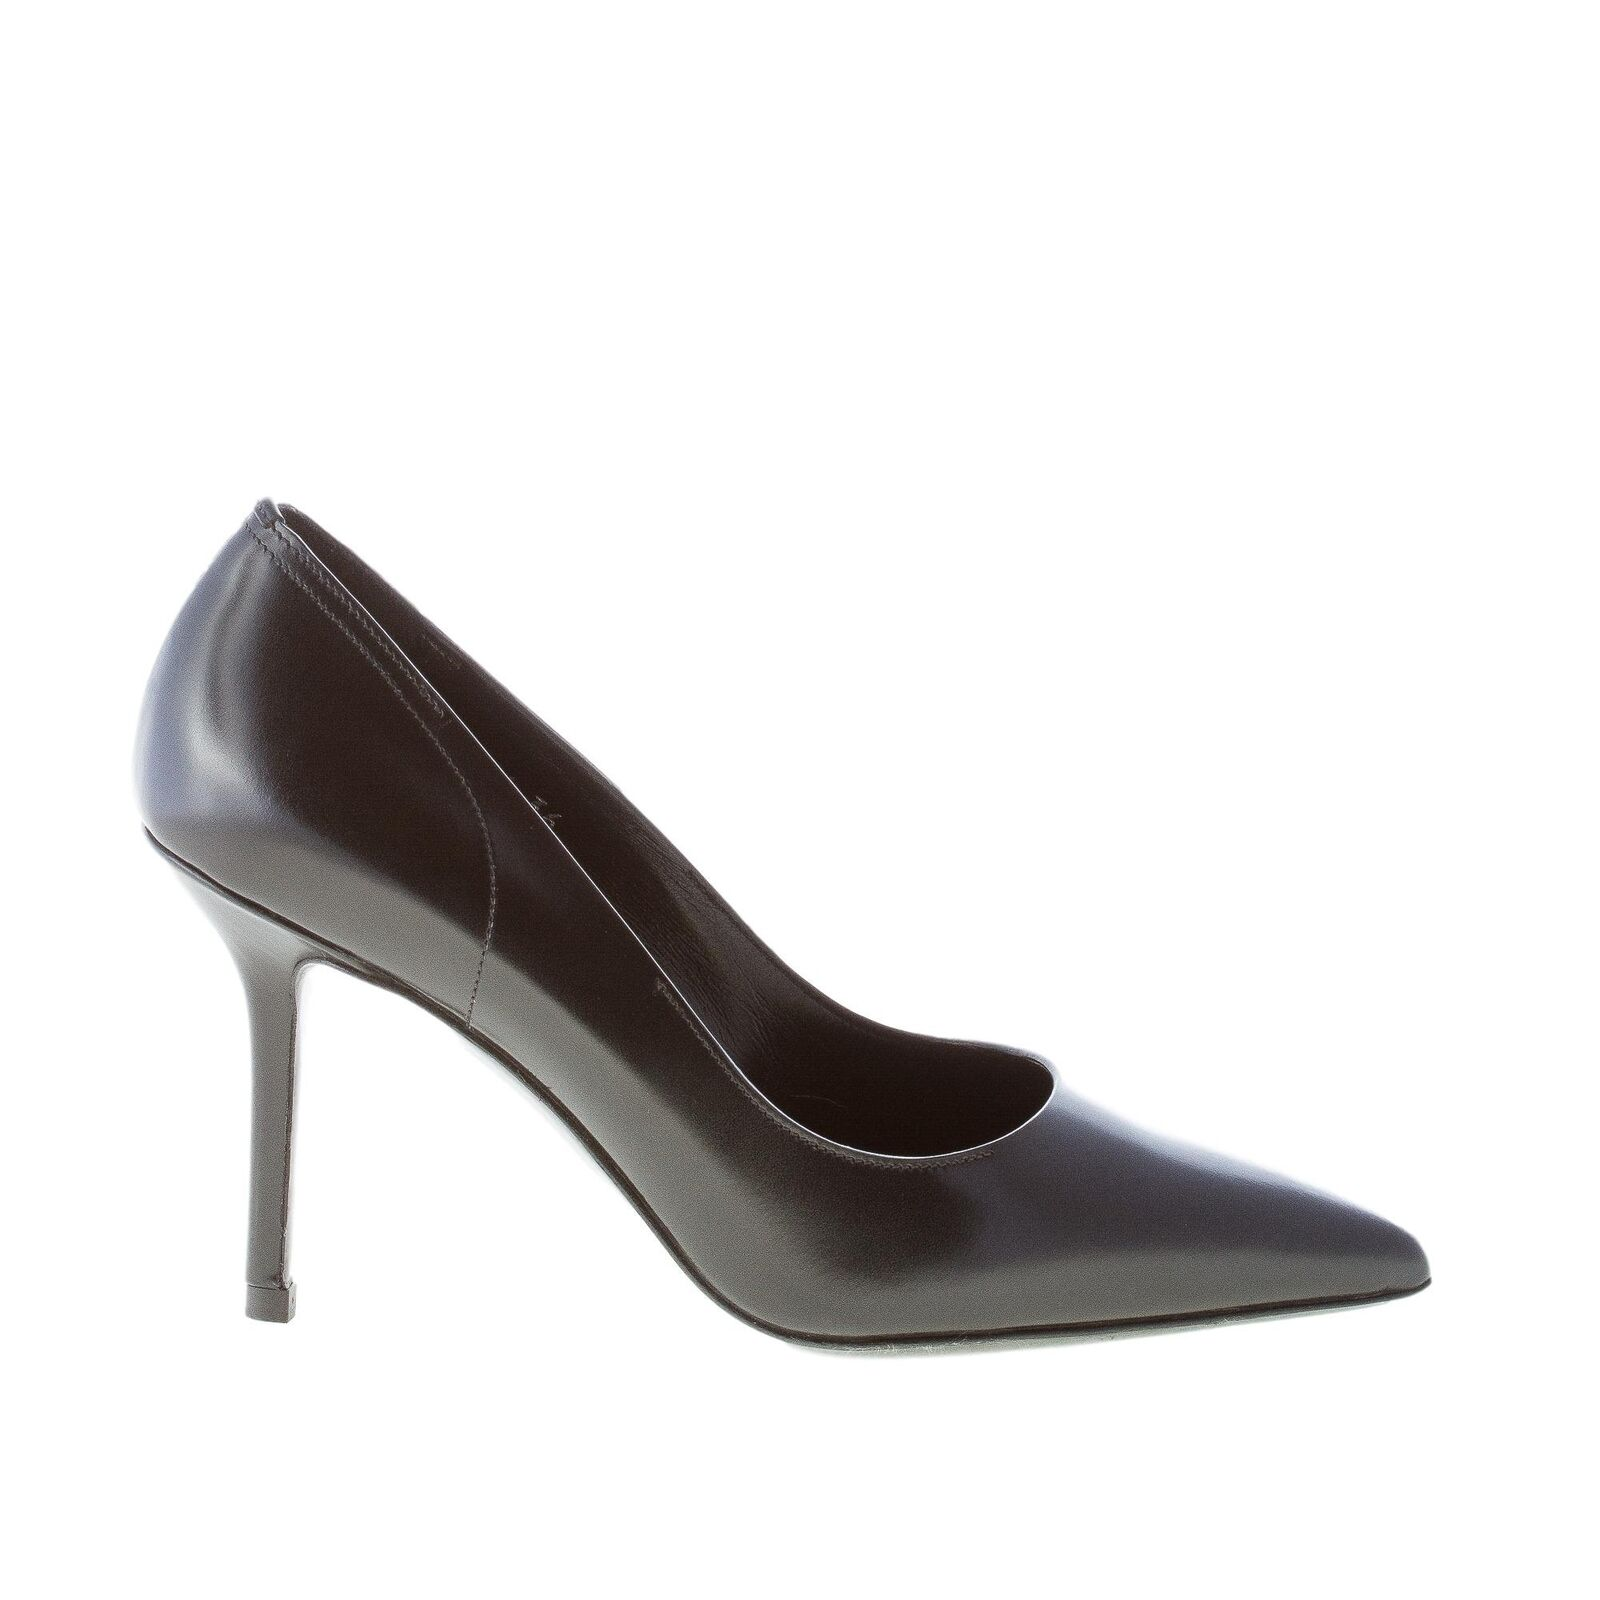 PREMIATA women shoes Black leather pointy toe pump M4196